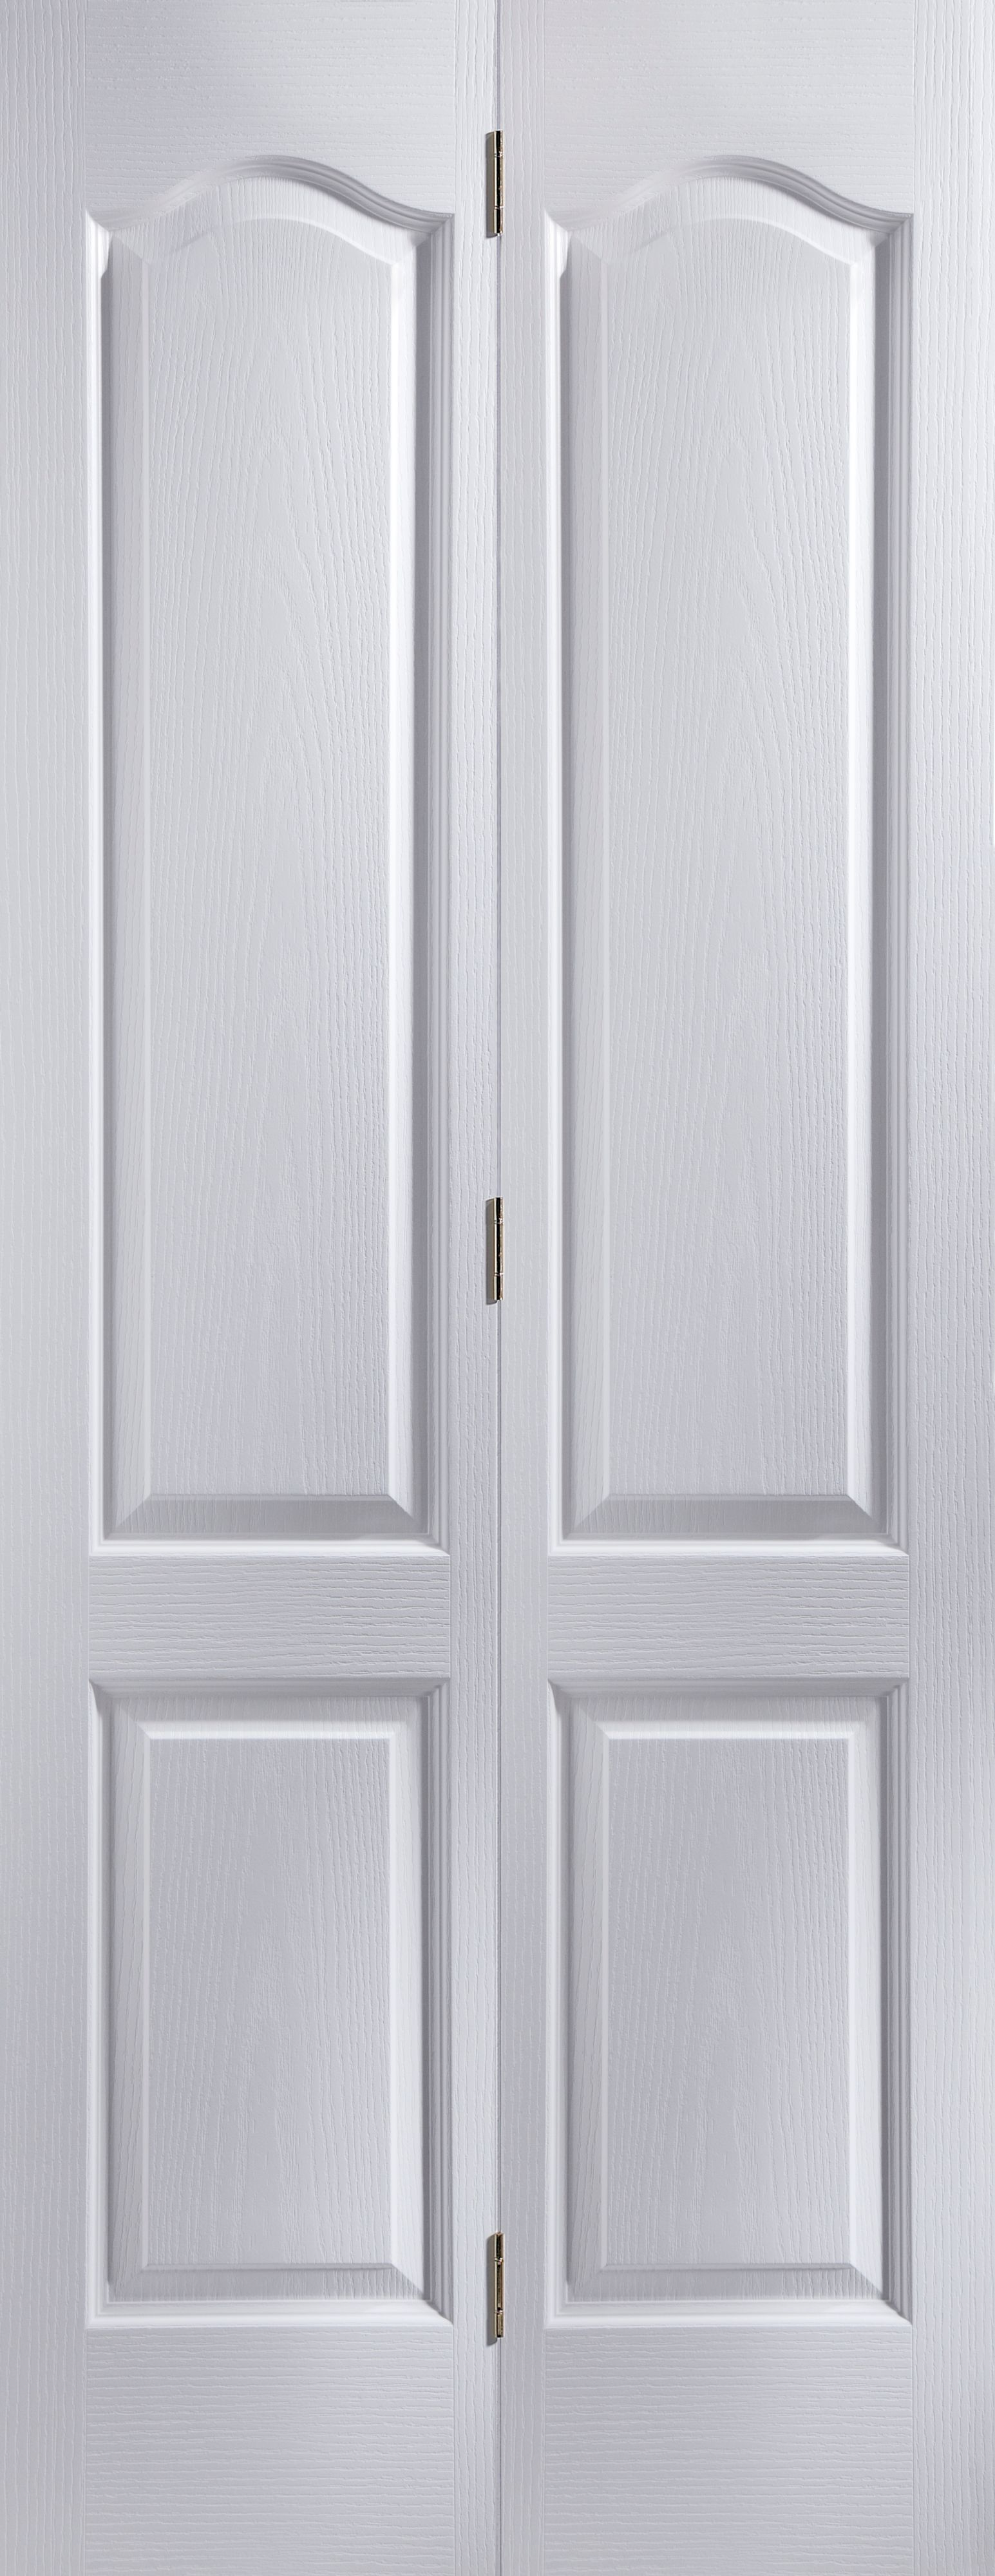 4 Panel Primed Woodgrain Effect Unglazed Internal Bi-fold Door, (h)1950mm (w)750mm